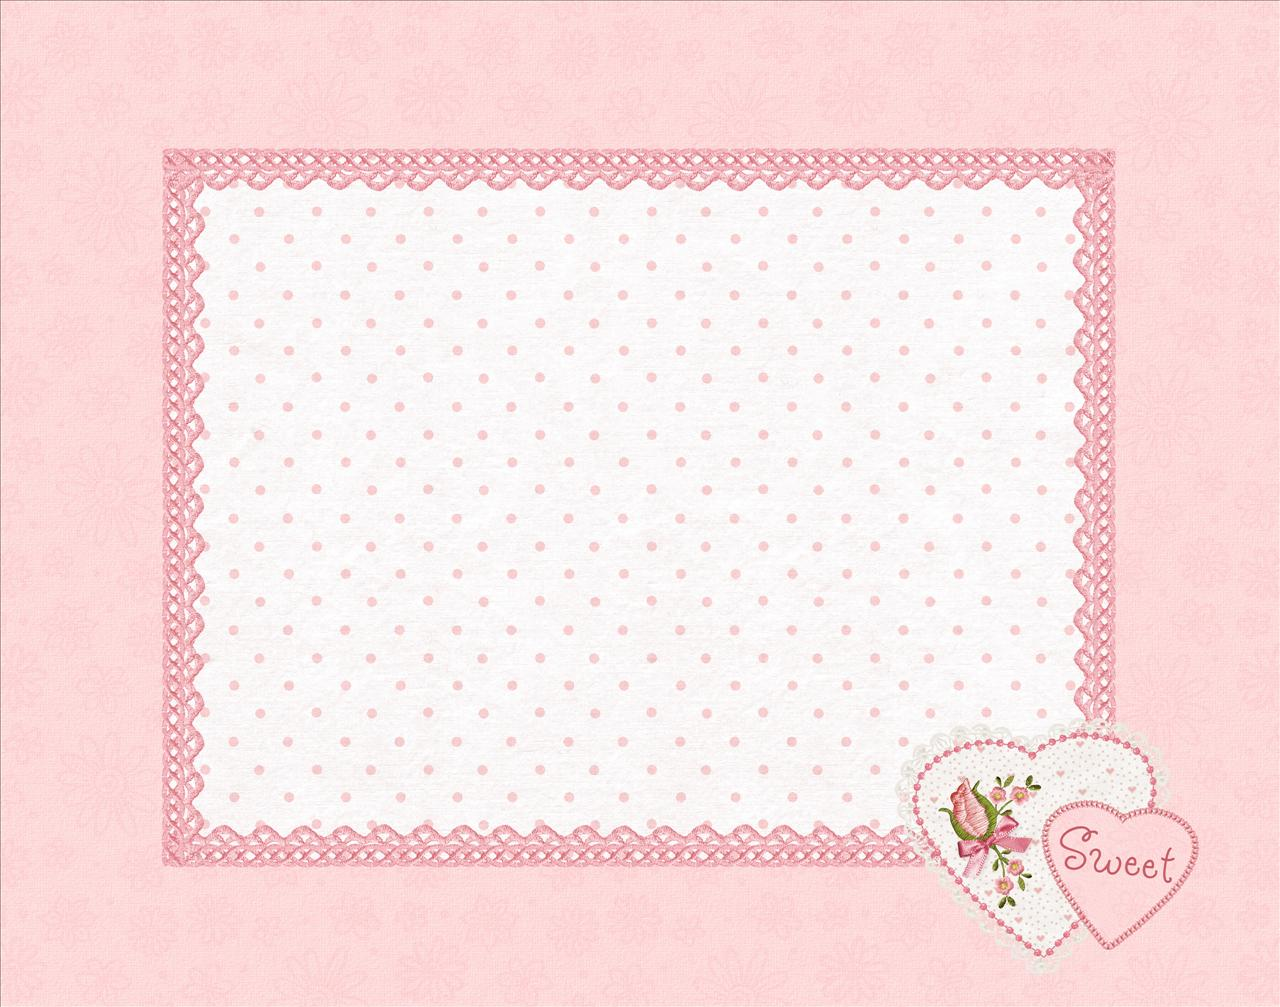 Baby Background Images - WallpaperSafari